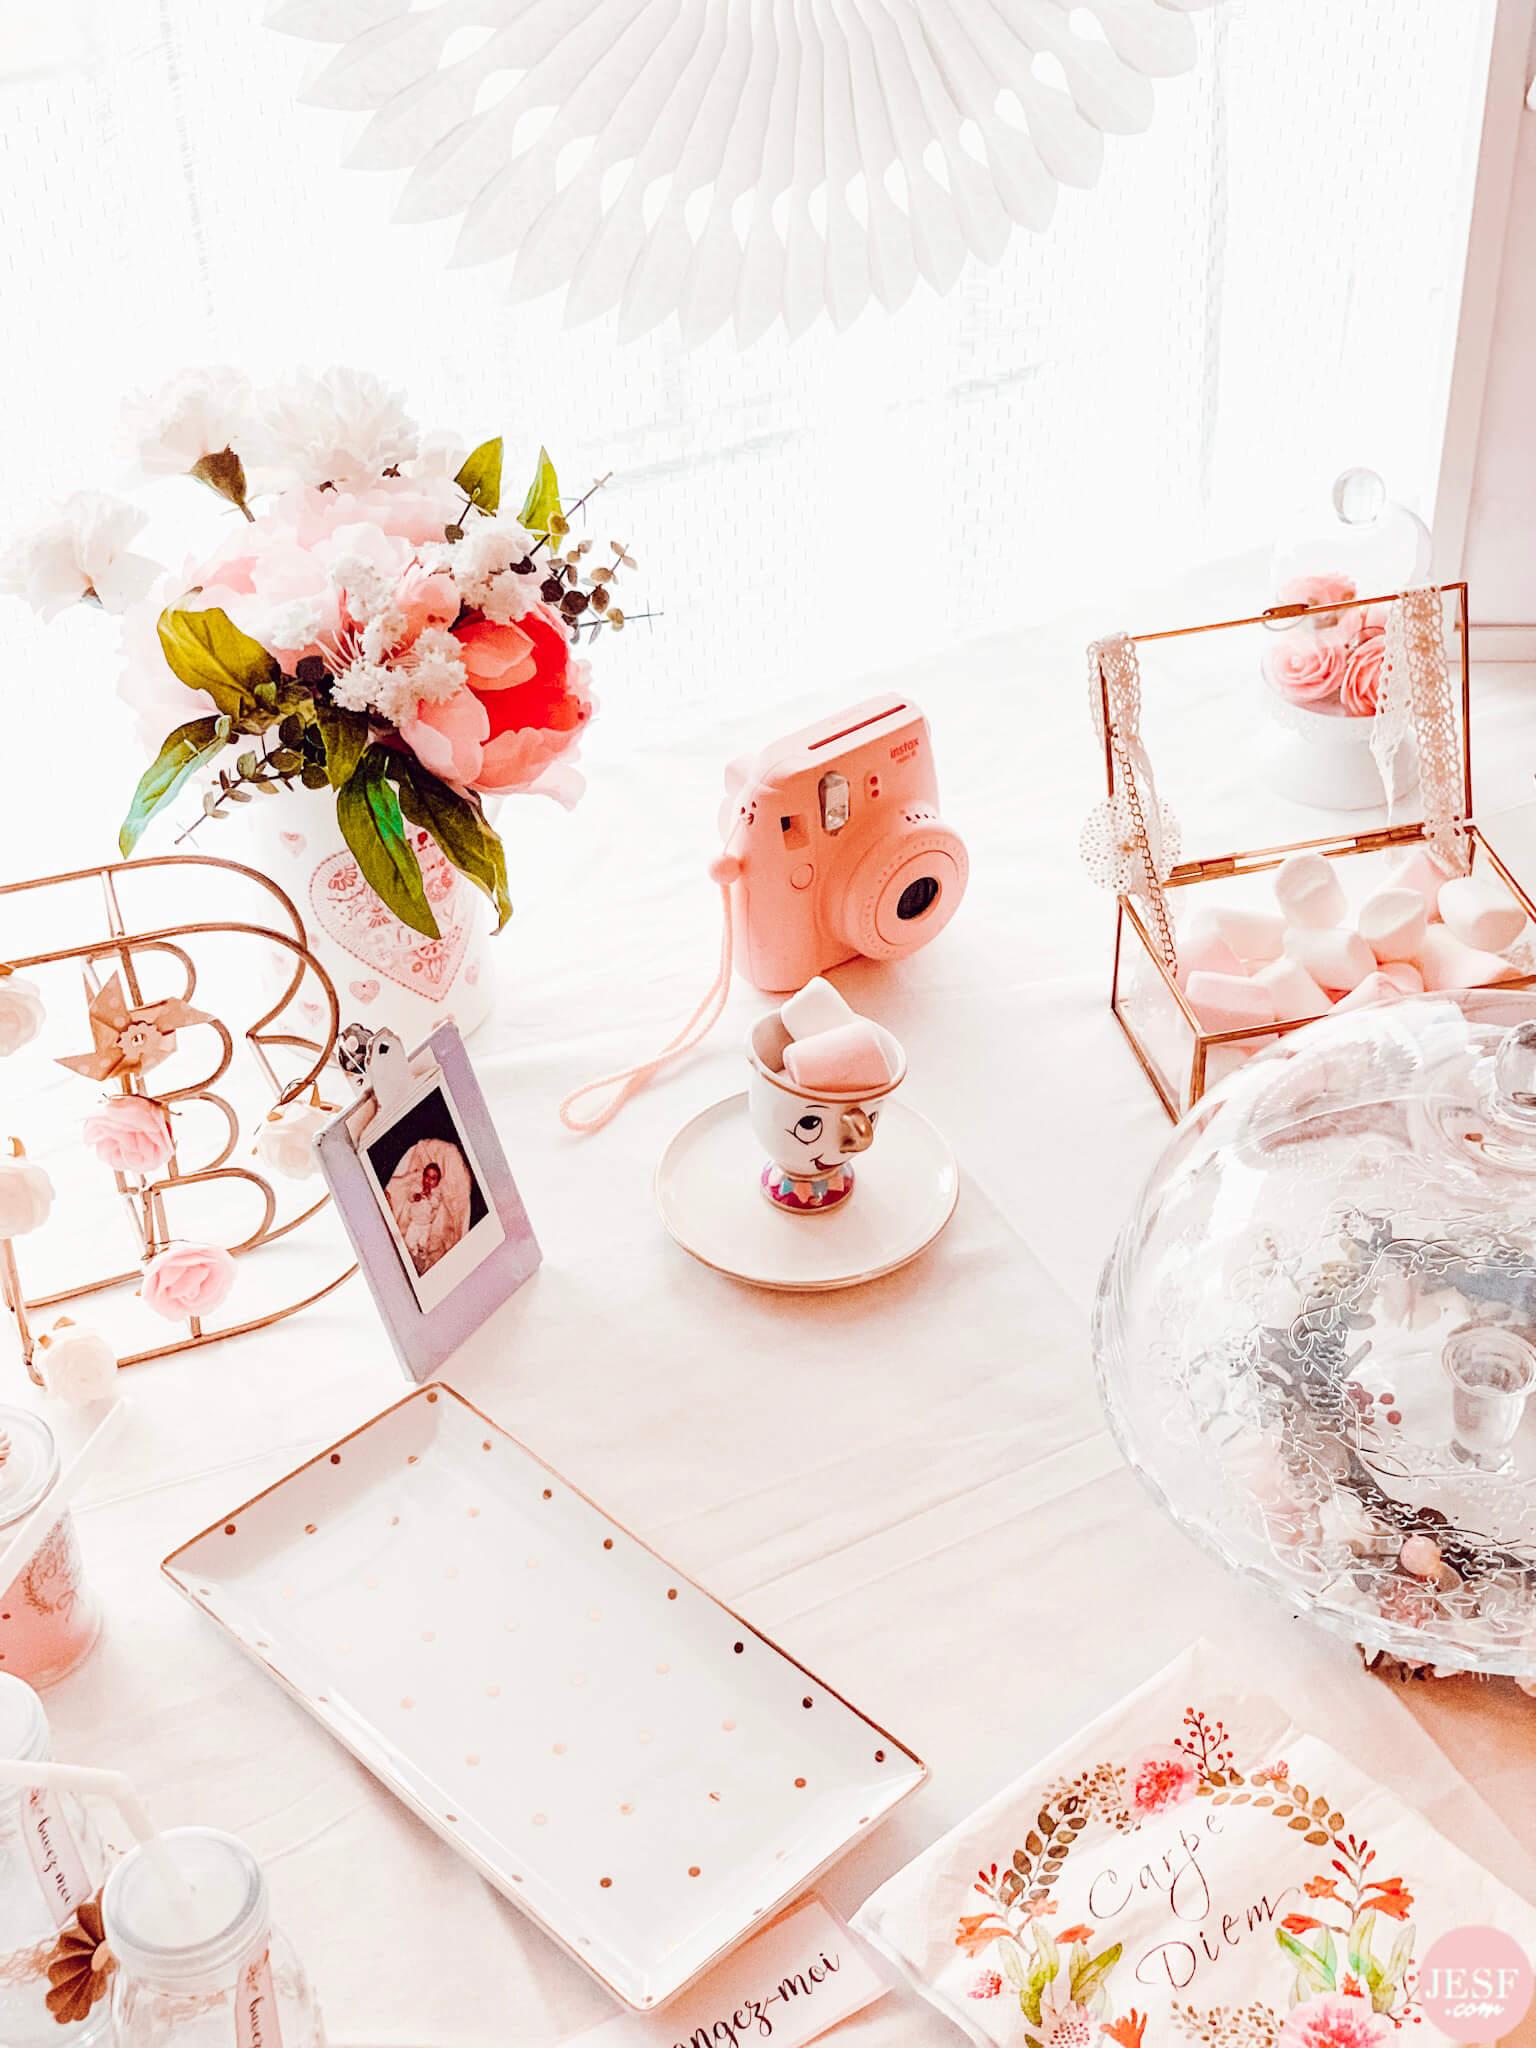 fête-anniversaire-sweet-table-petite-fille-1-an-girly-rose-féérique